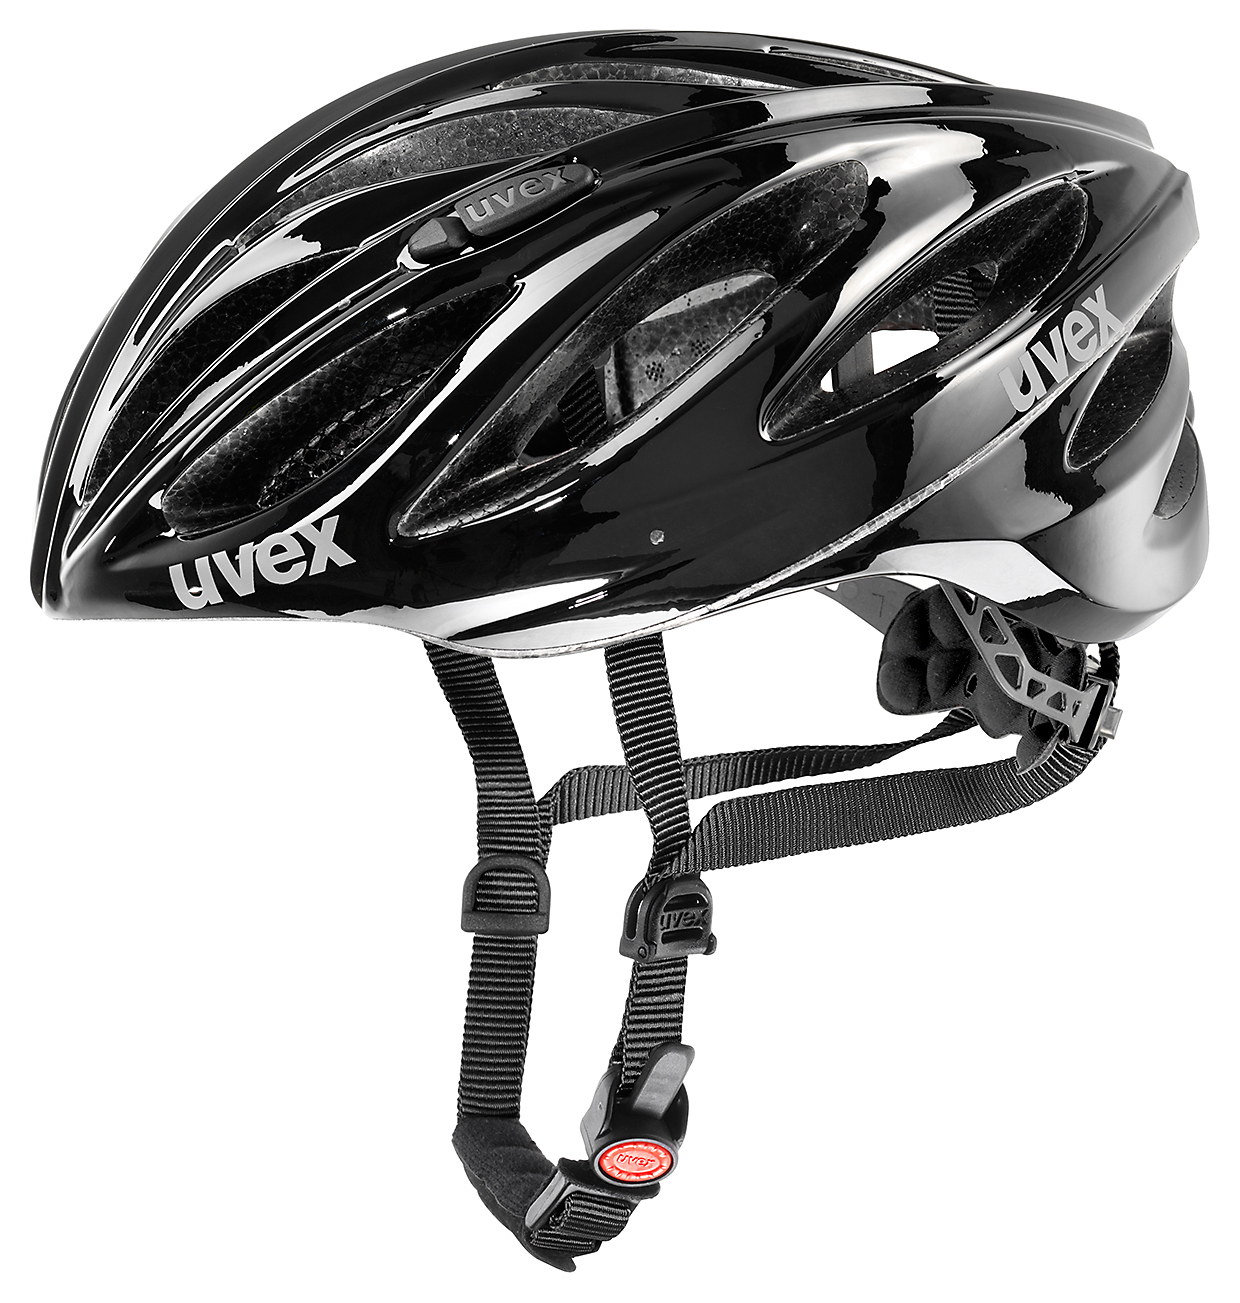 UVEX BOSS RACE, BLACK 2015 52-56 cm